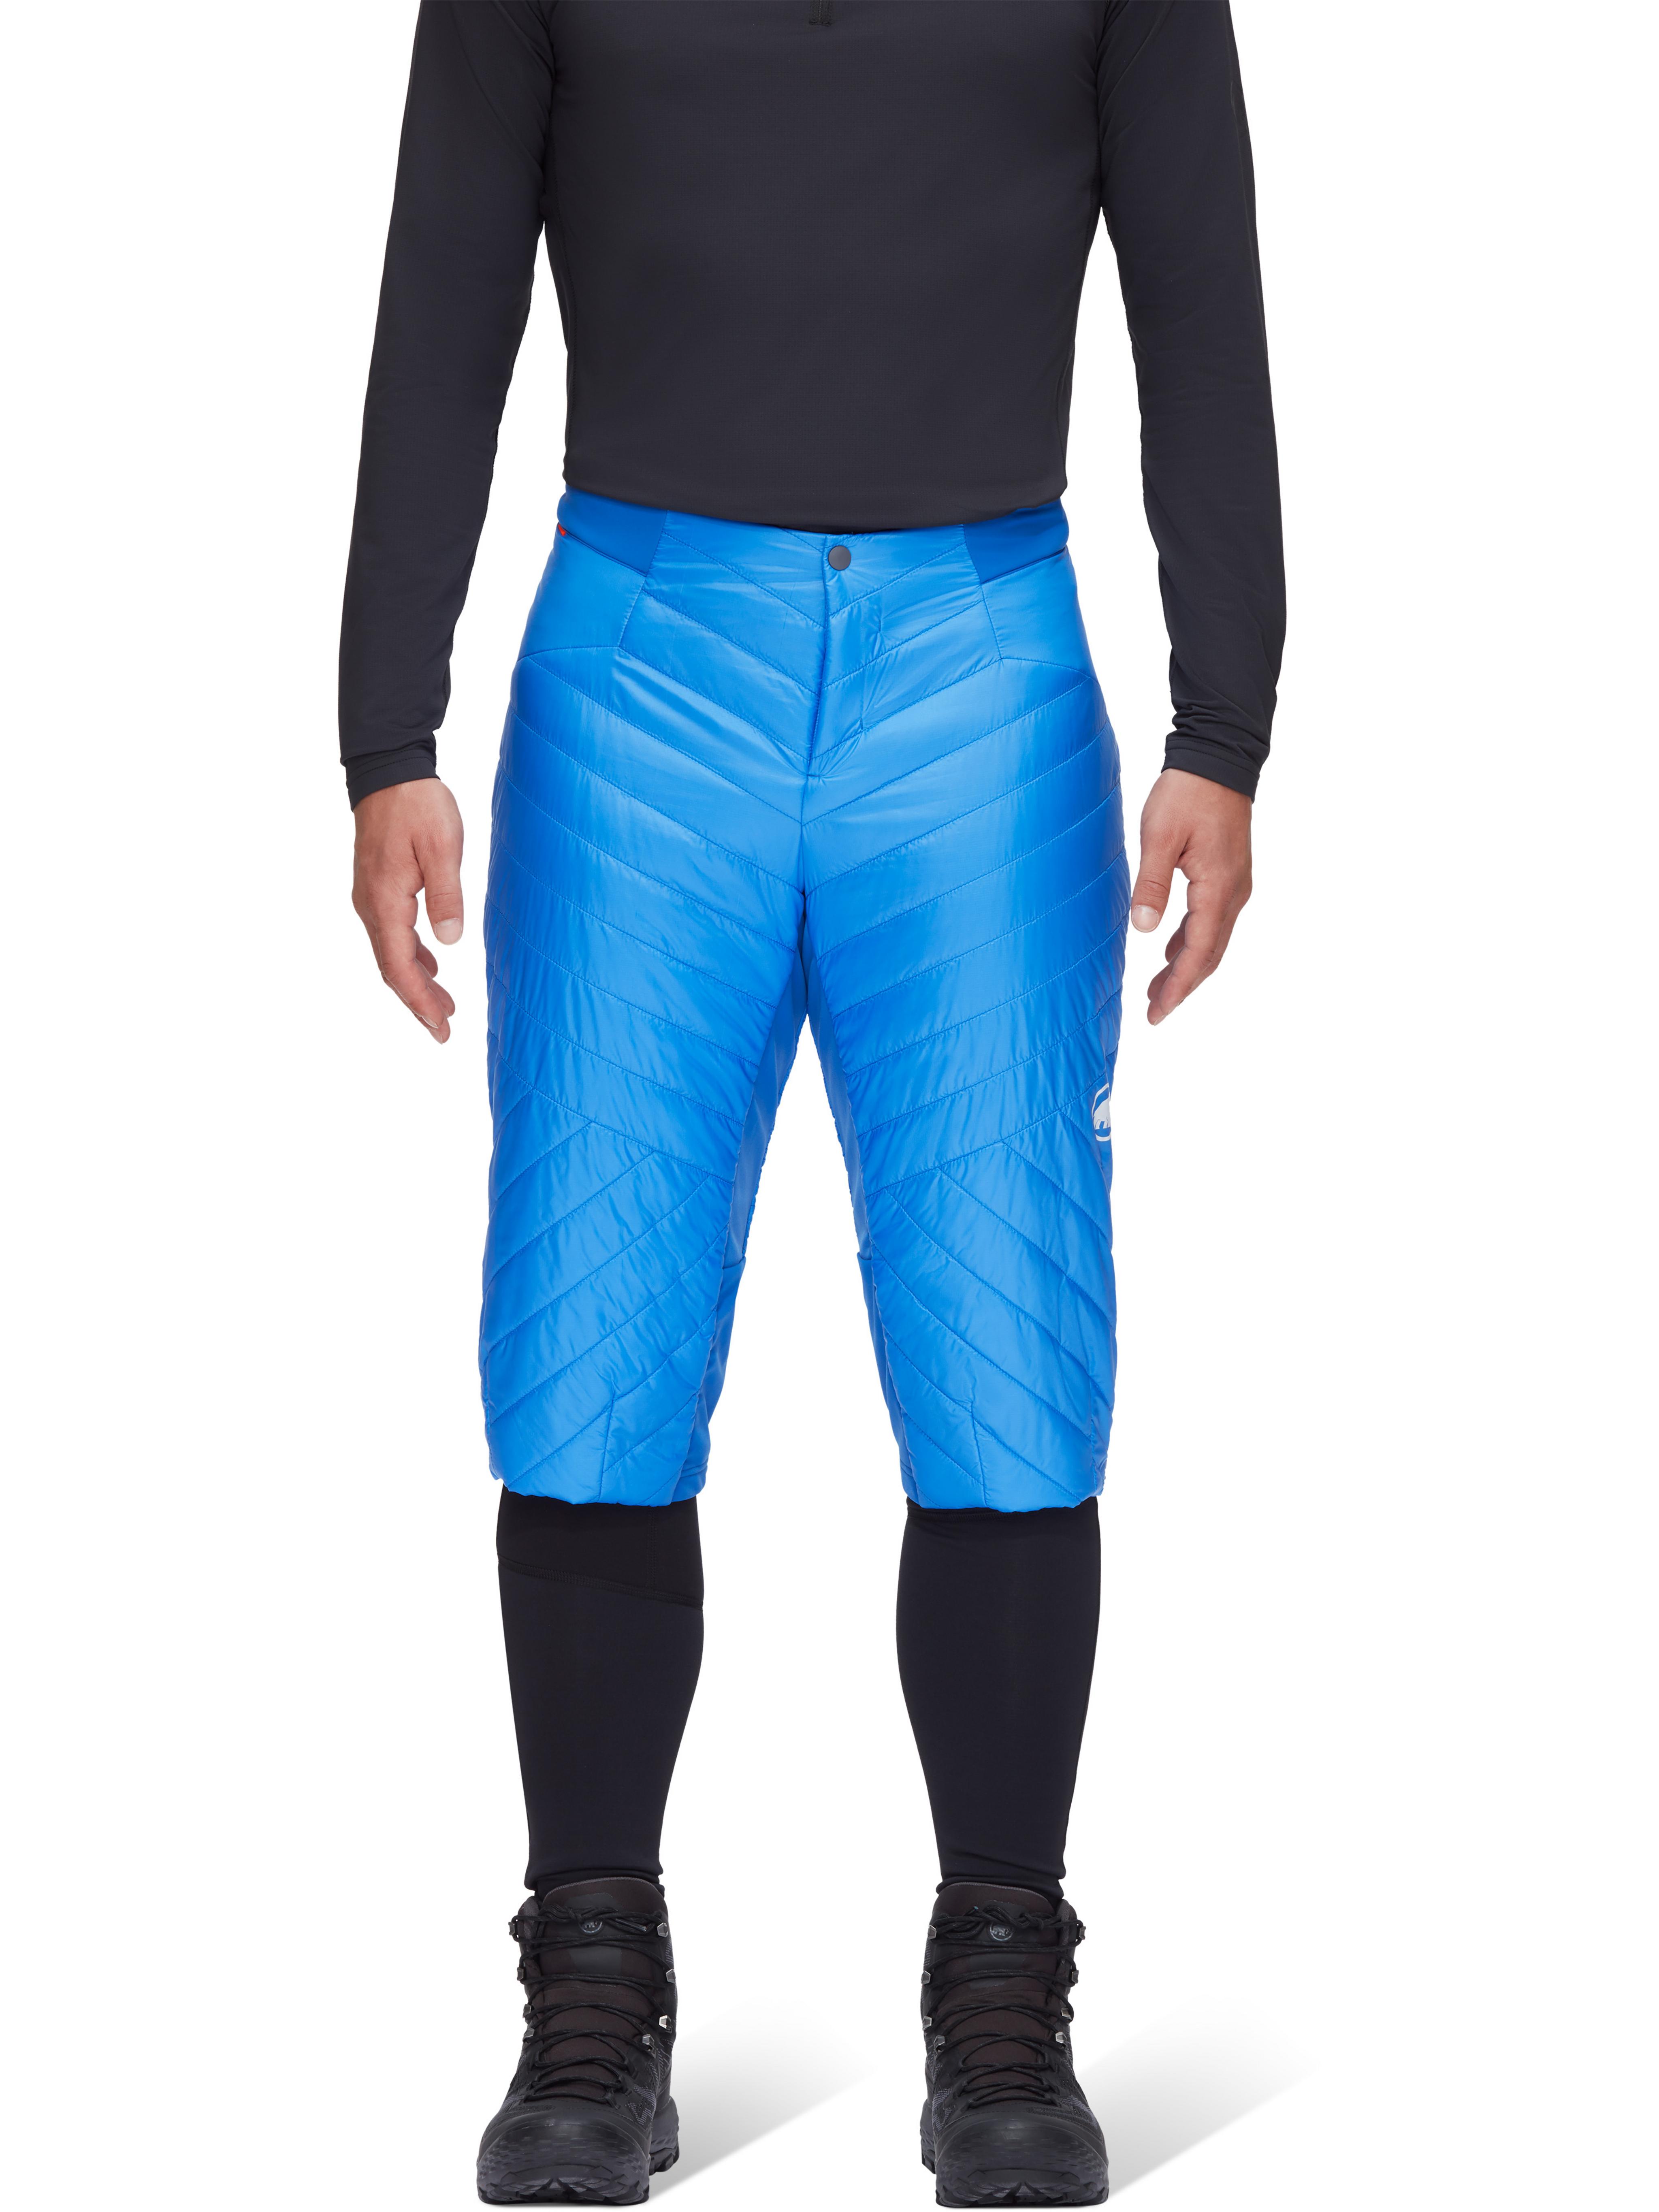 Aenergy IN Shorts Men product image